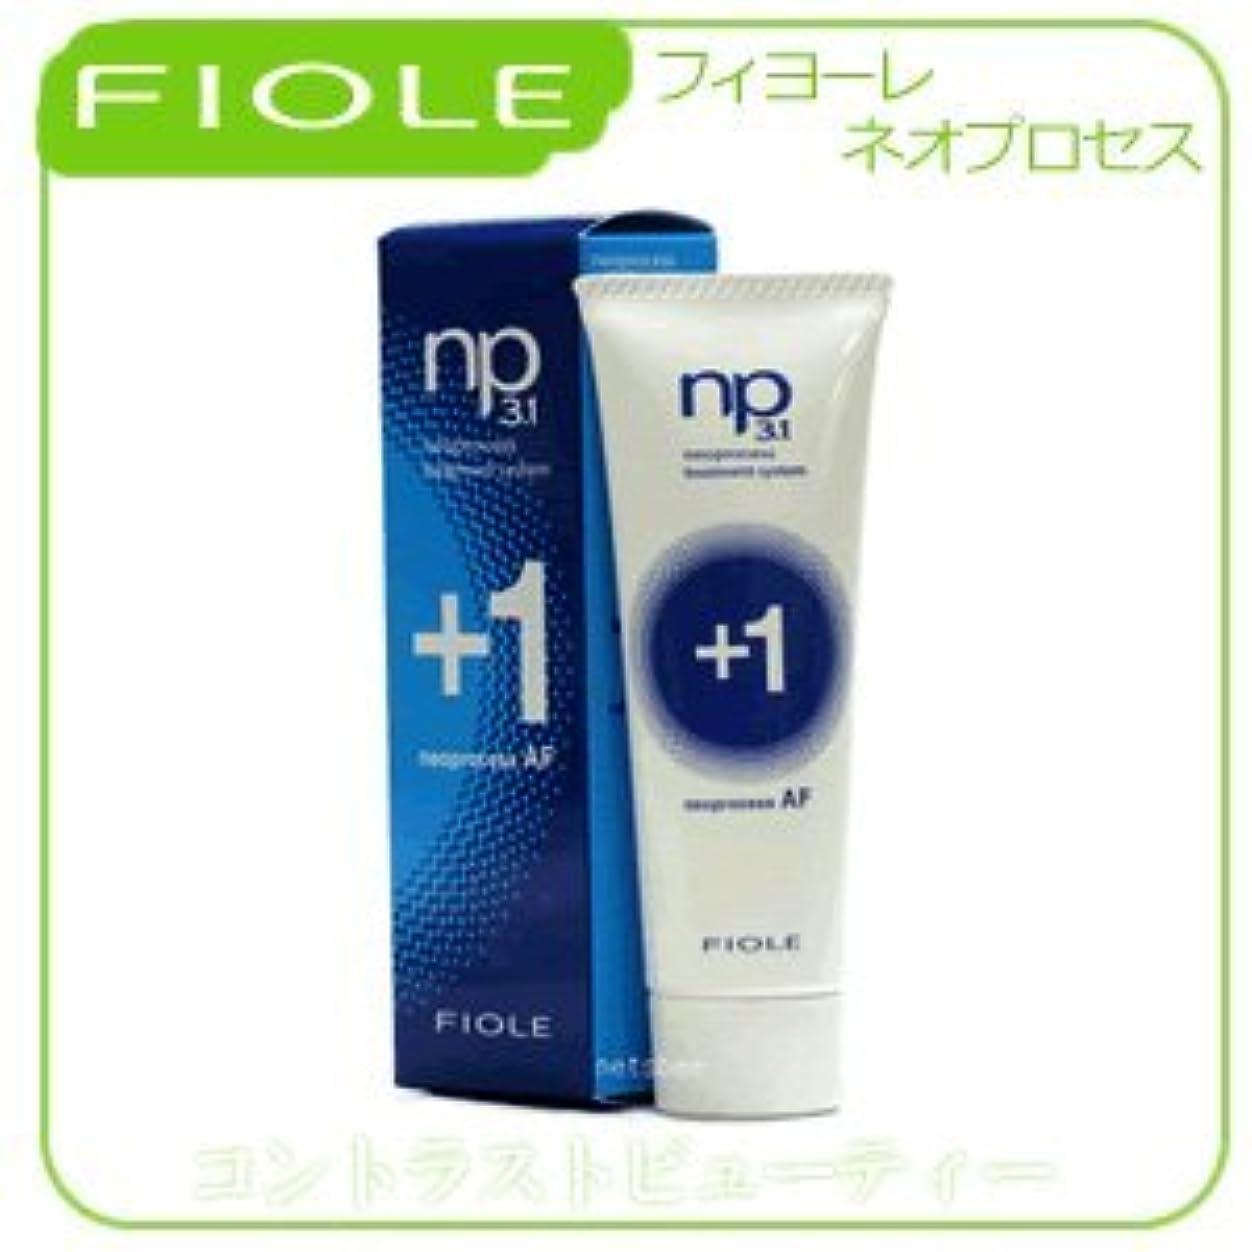 【X4個セット】 フィヨーレ NP3.1 ネオプロセス AFプラス1 240g FIOLE ネオプロセス